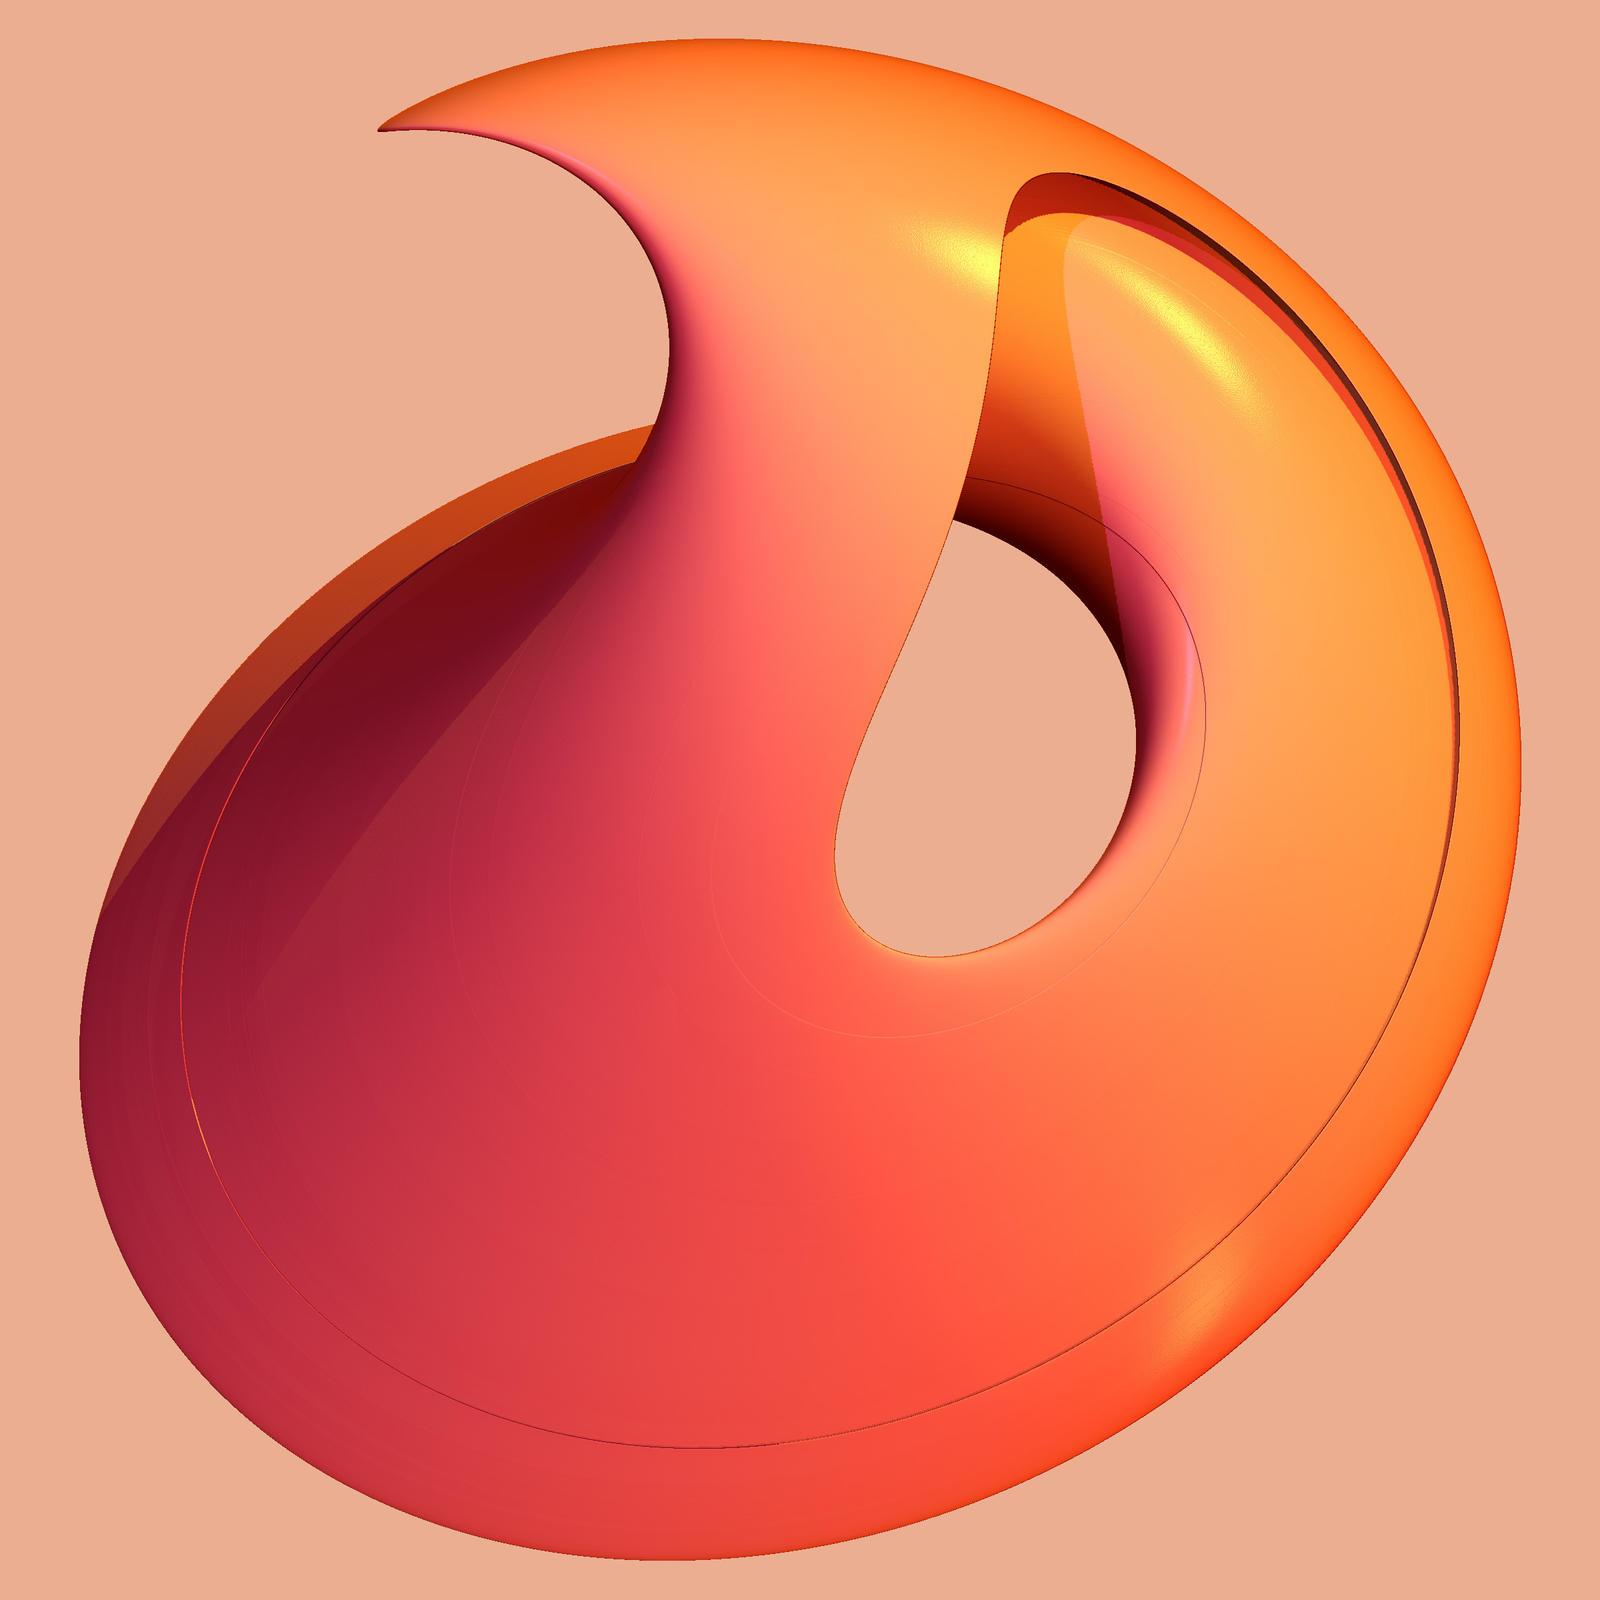 Chaoscope 24 - Orange by mario837